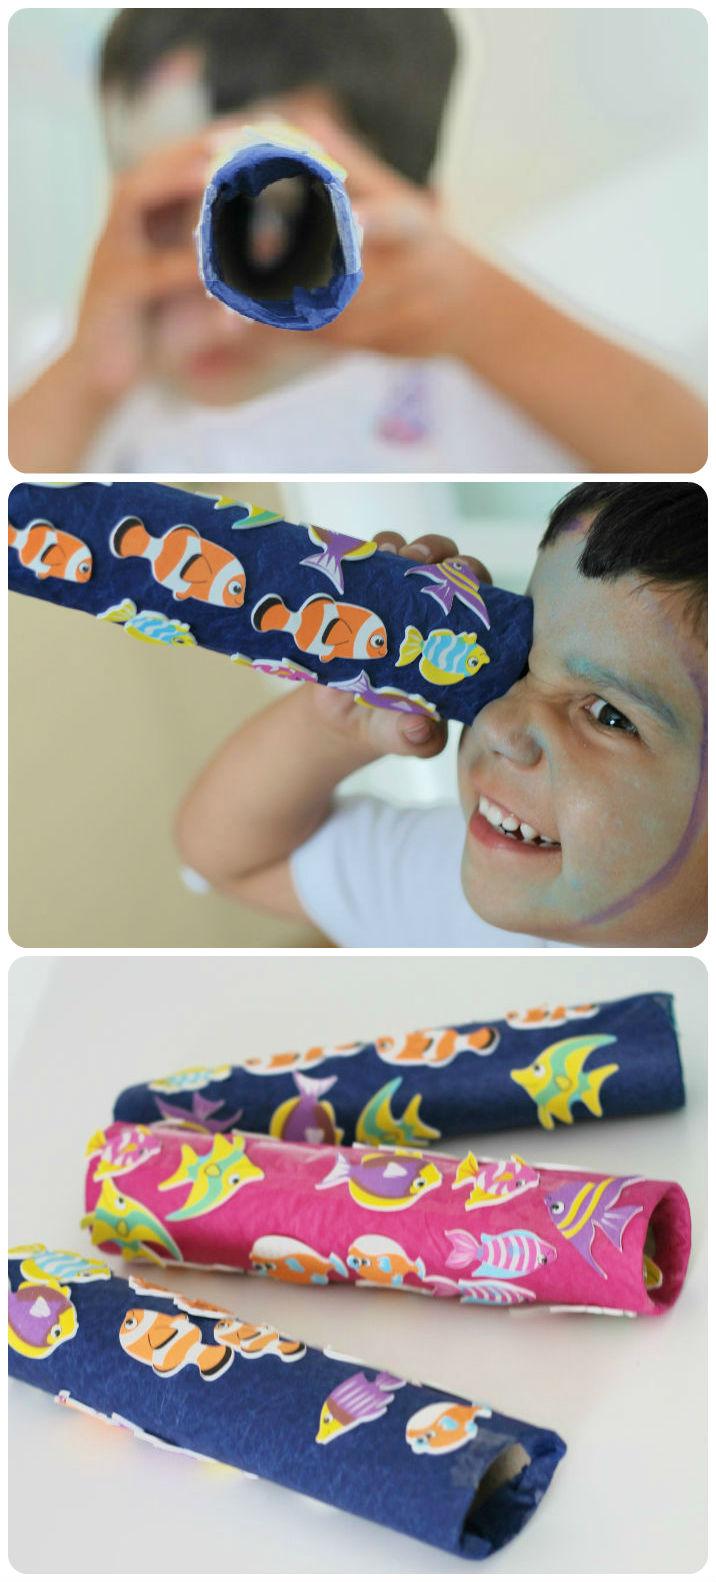 Summer craft idea - Make a telescope with a tropical fish theme!